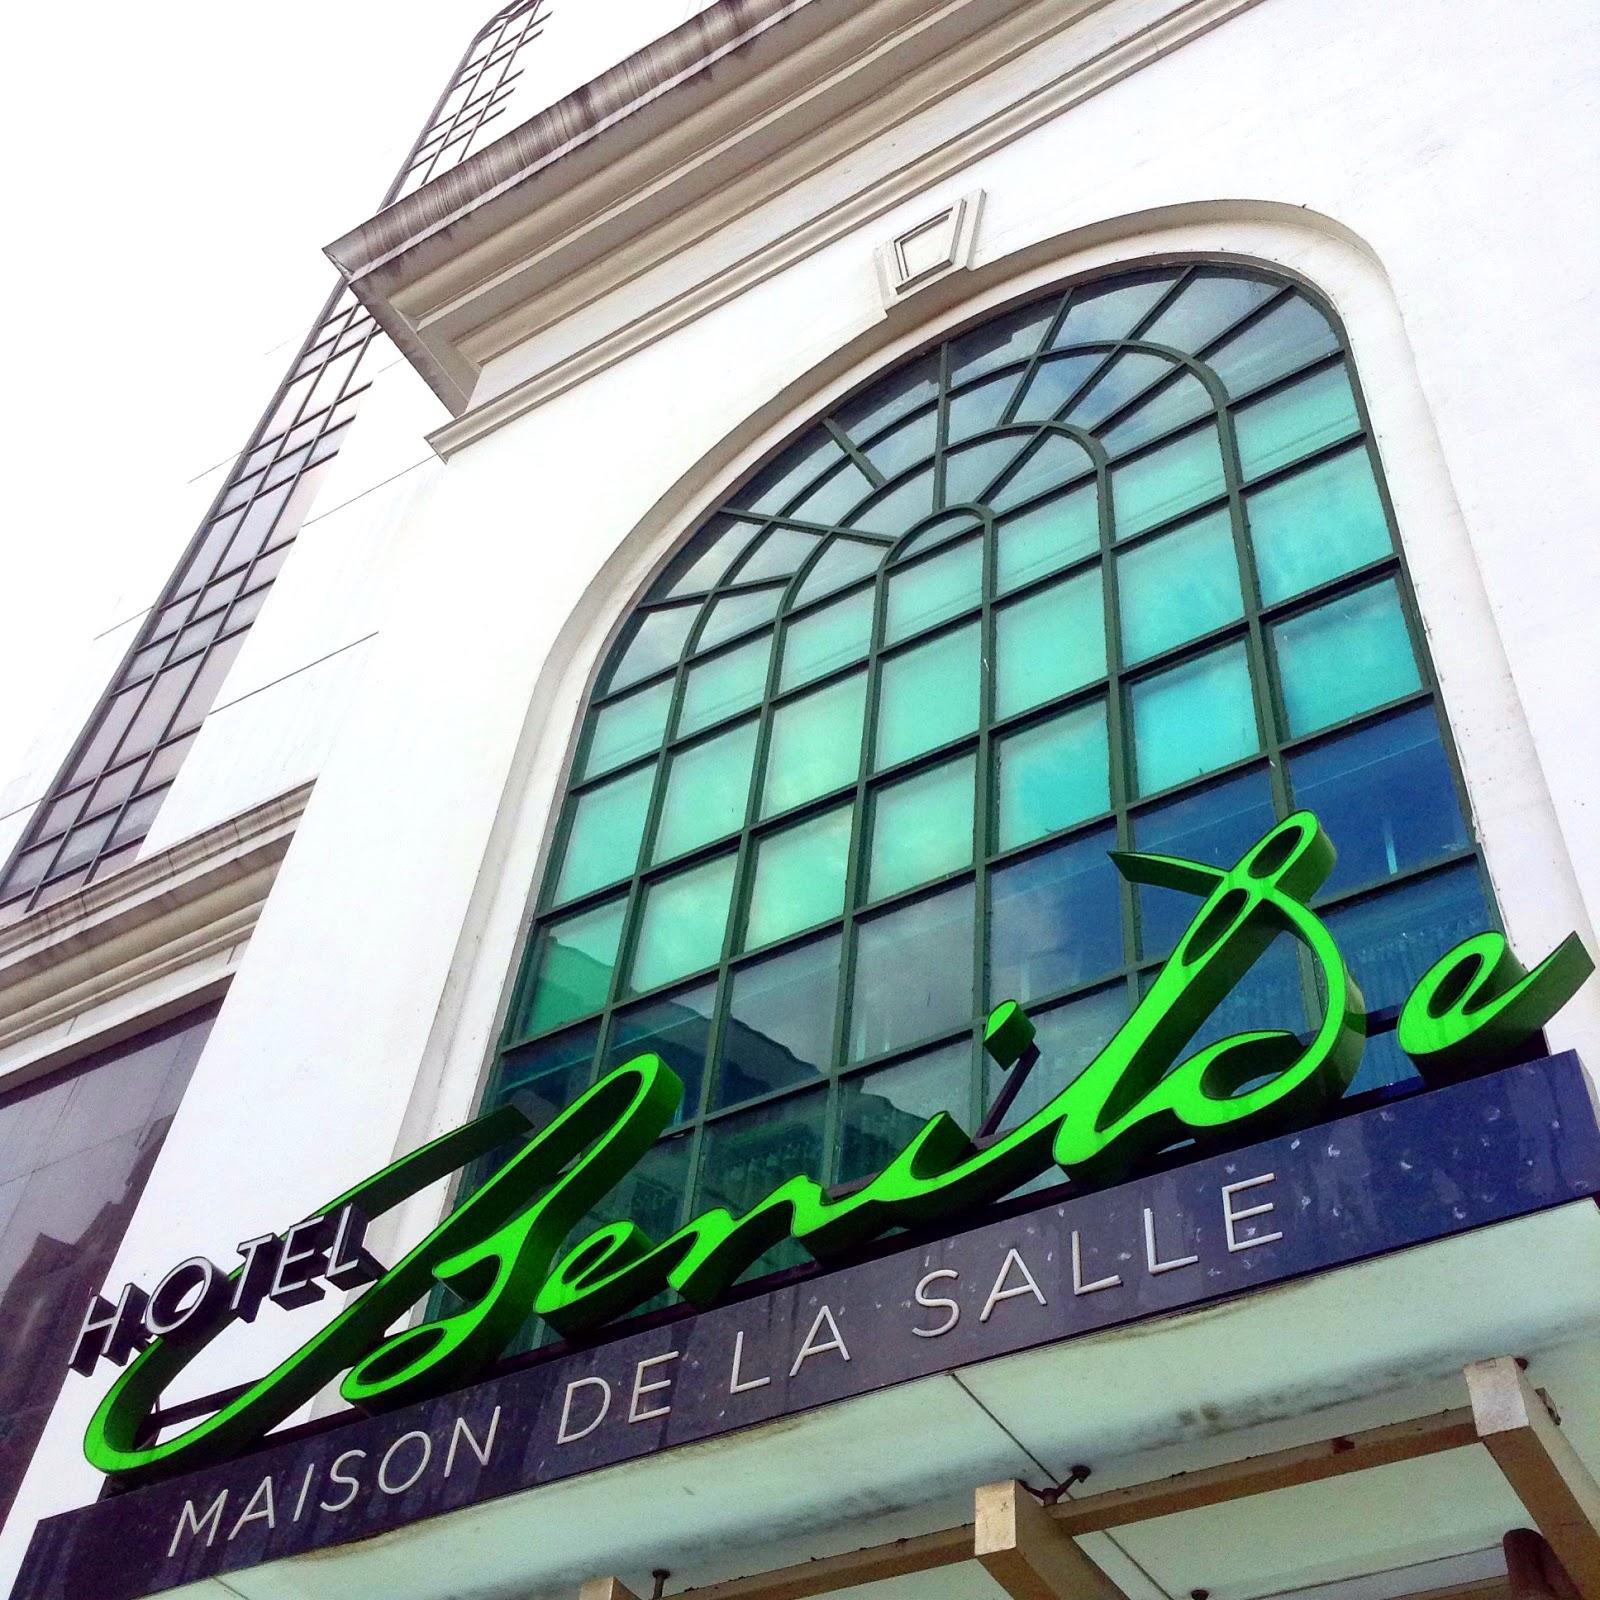 Maison De La Salle solo expeditions: experiencing the lasallian standard of